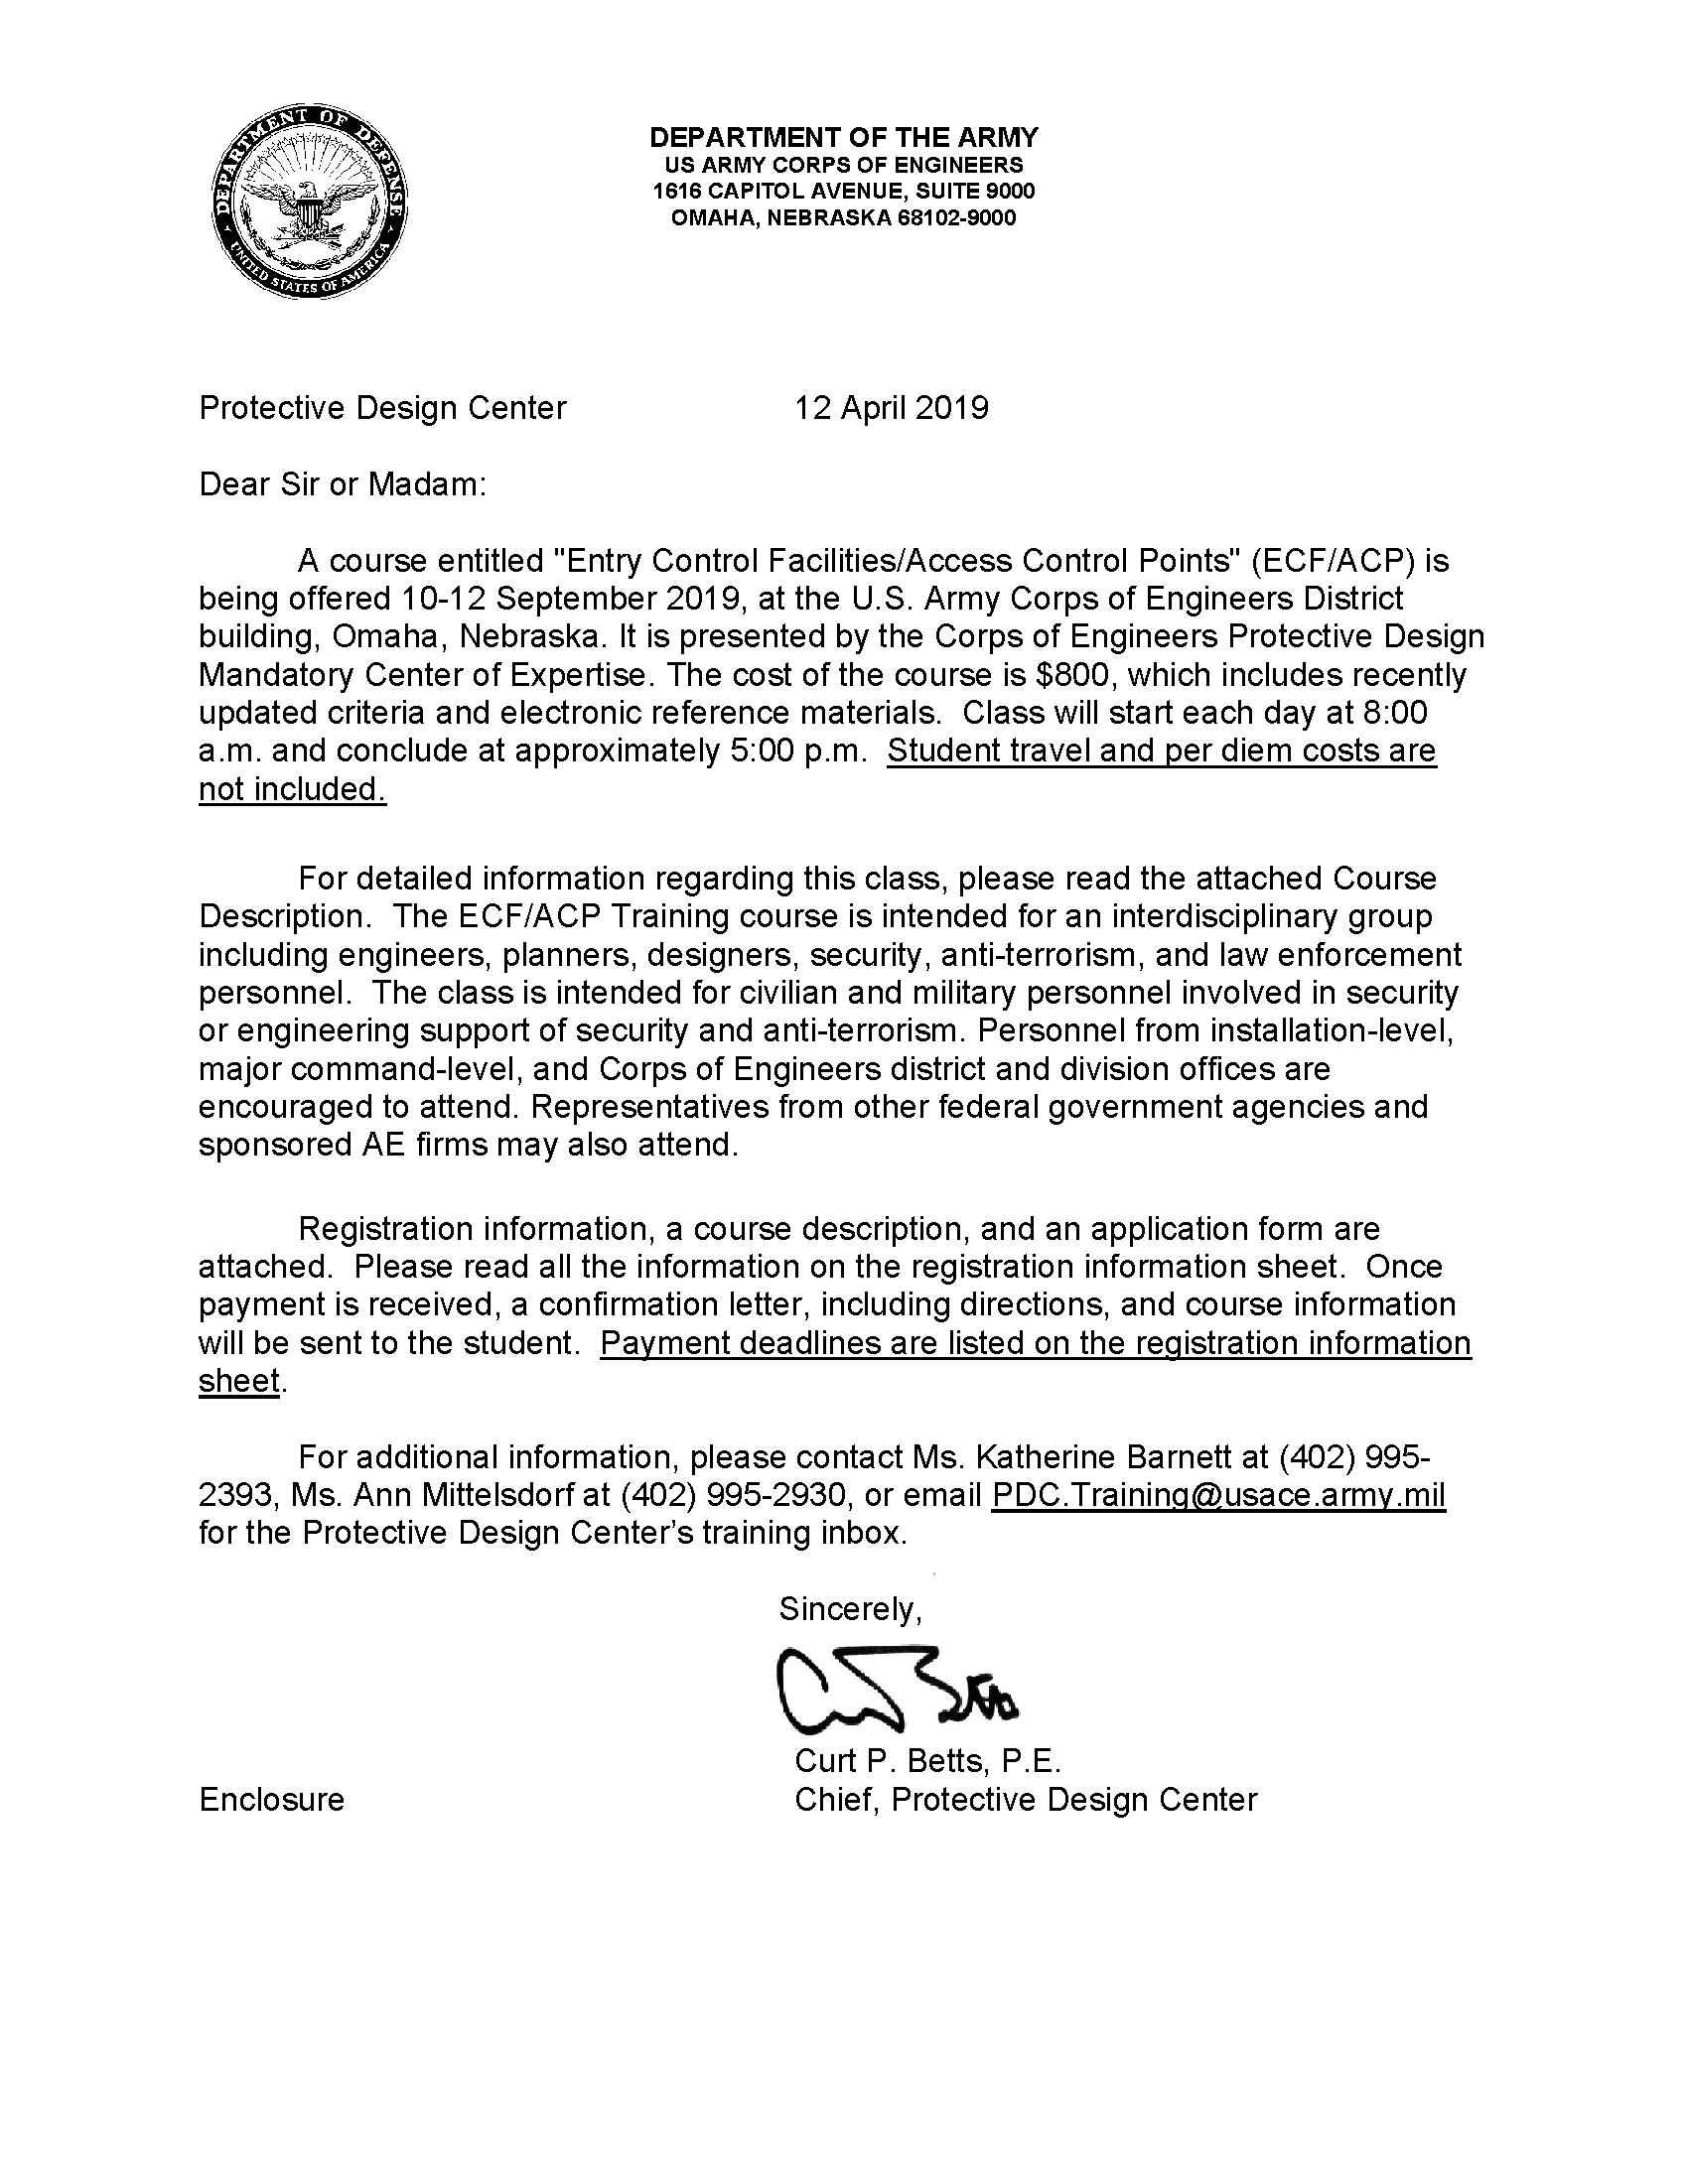 Letter regarding course entitled